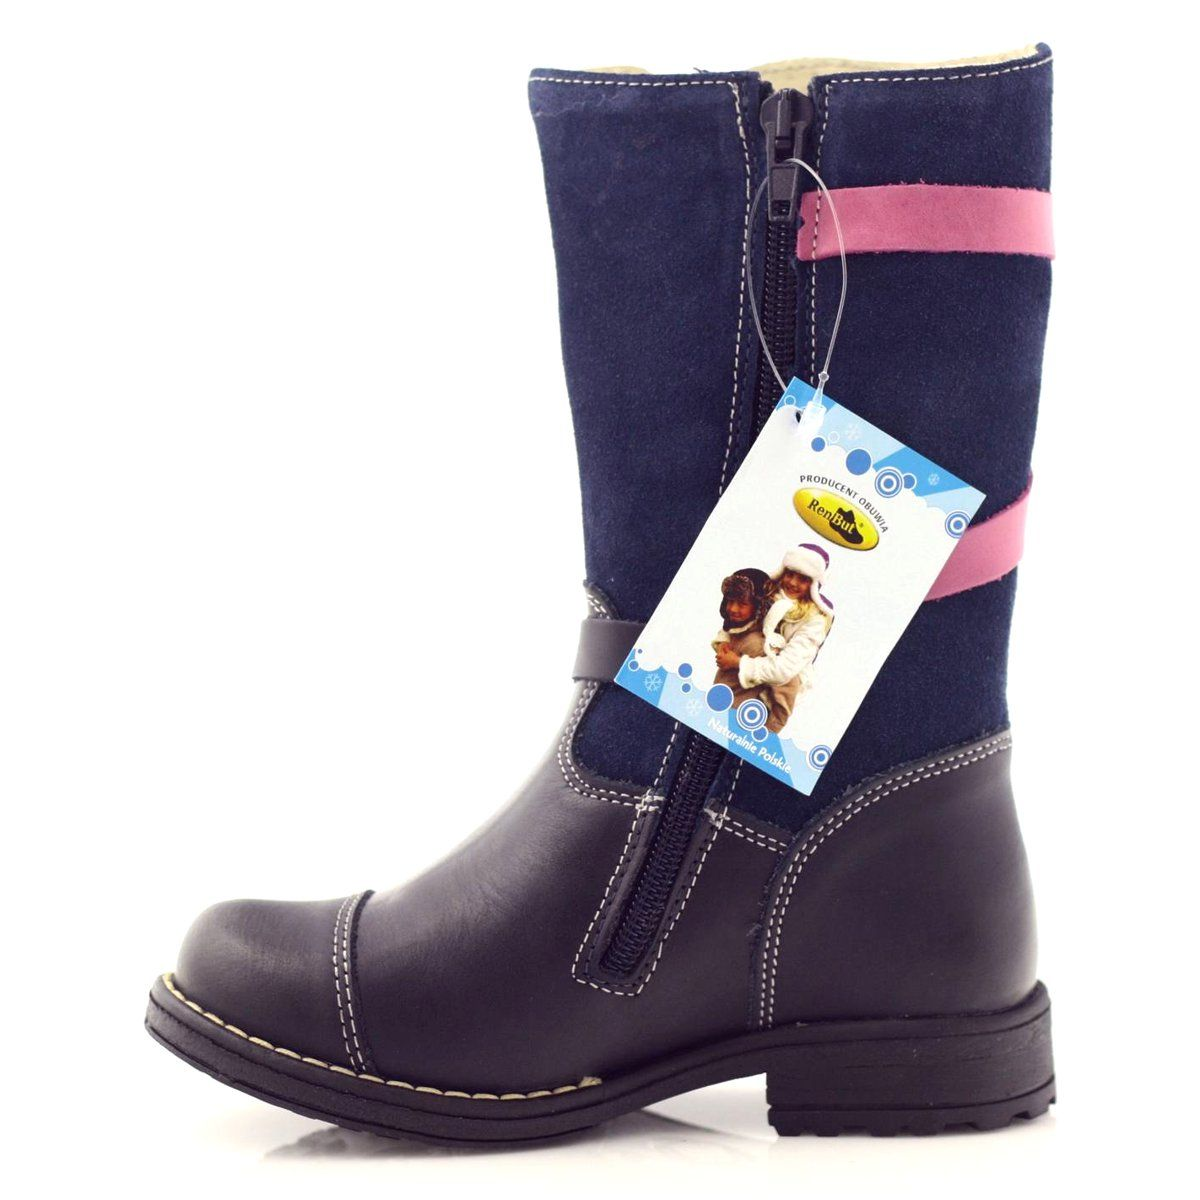 Kozaczki Buty Dzieciece Zimowe Ren But 3172 Granatowe Rozowe Boots Shoes Winter Boot